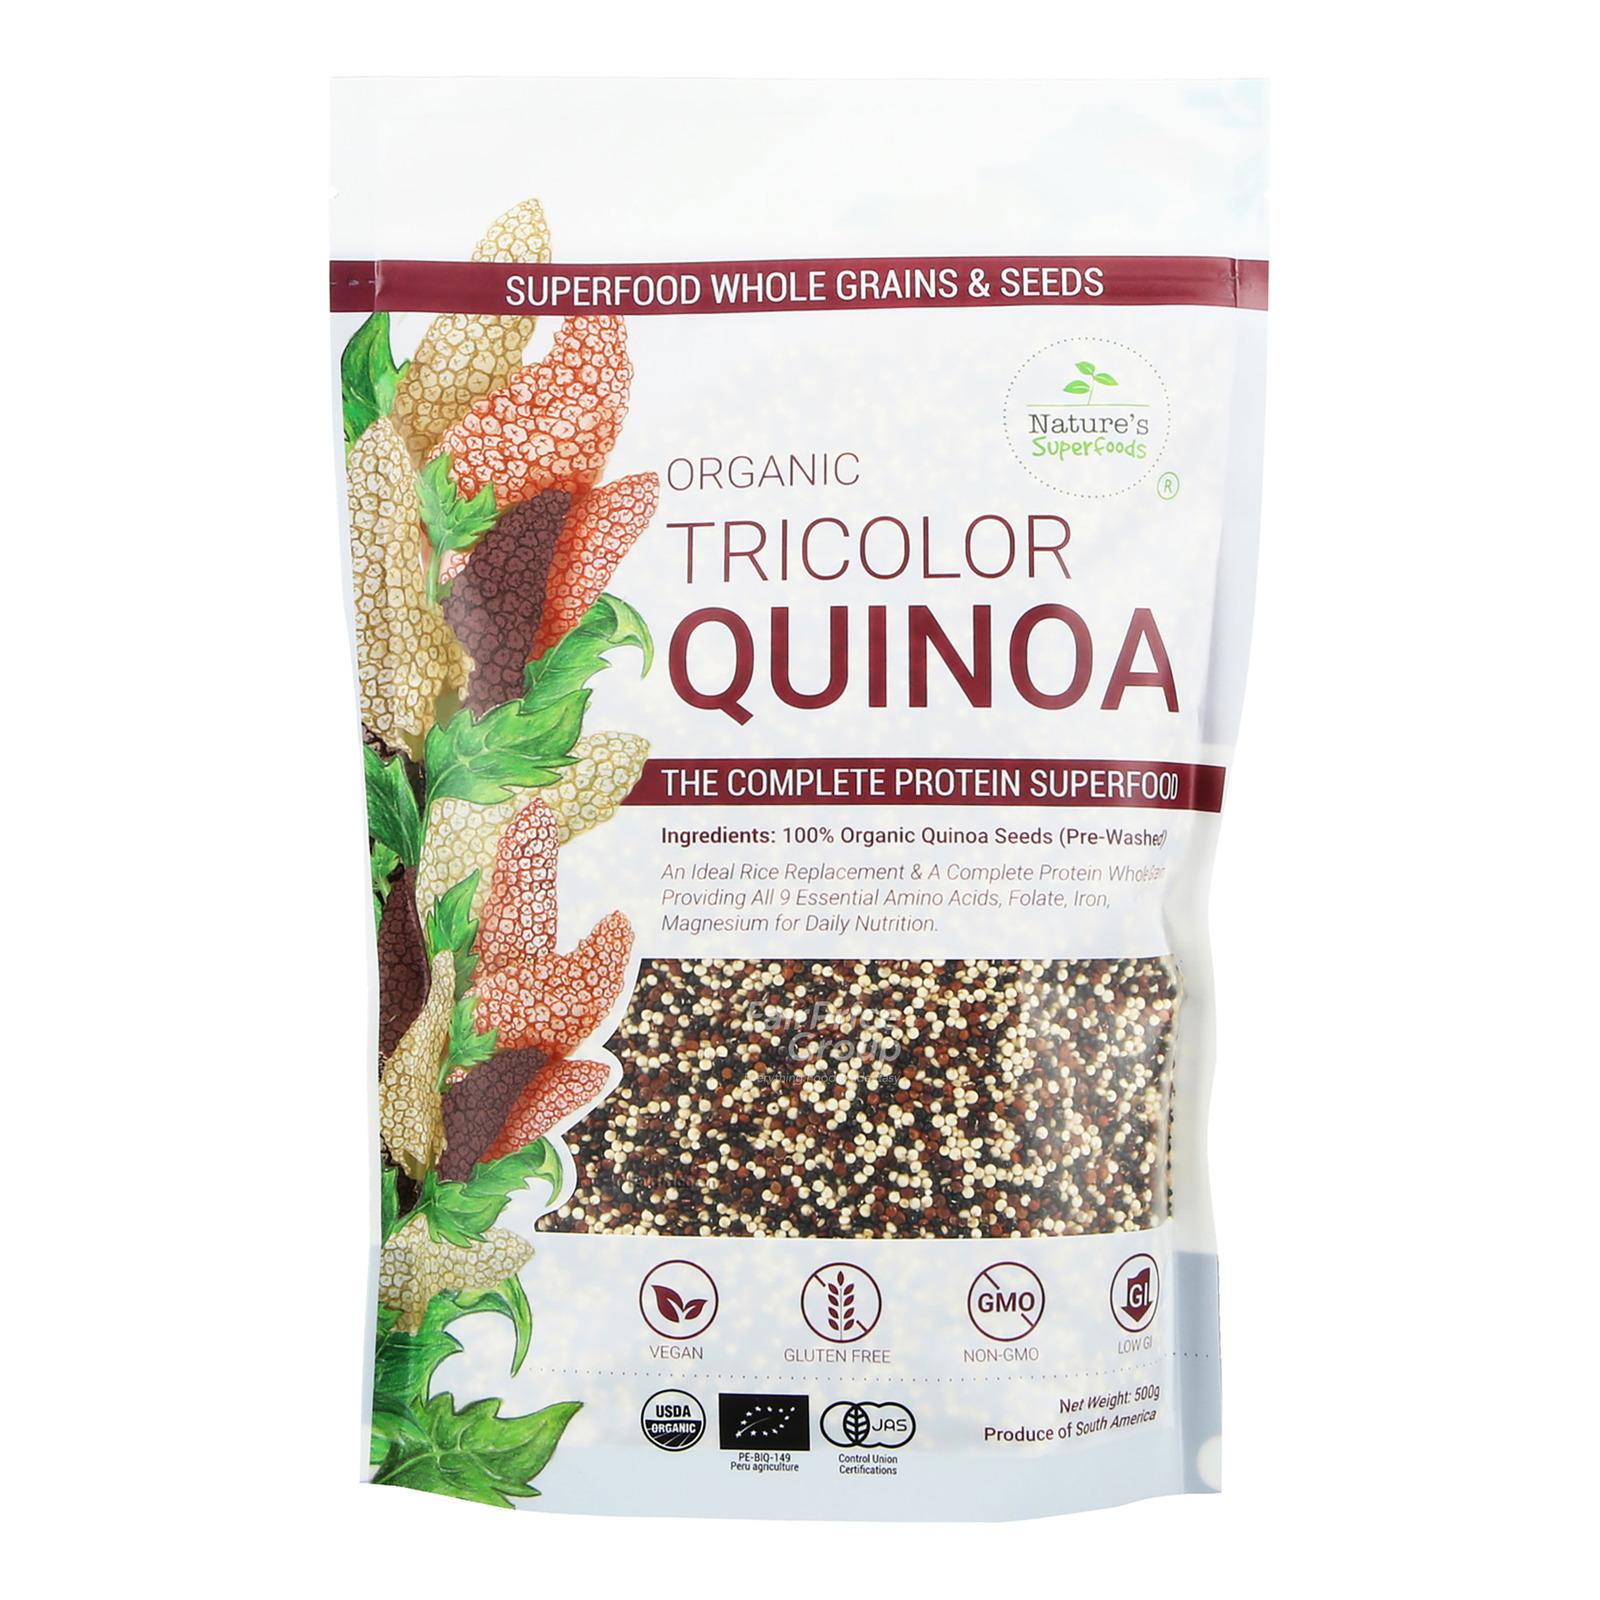 Nature's Superfoods Organic Tricolor Quinoa Seeds